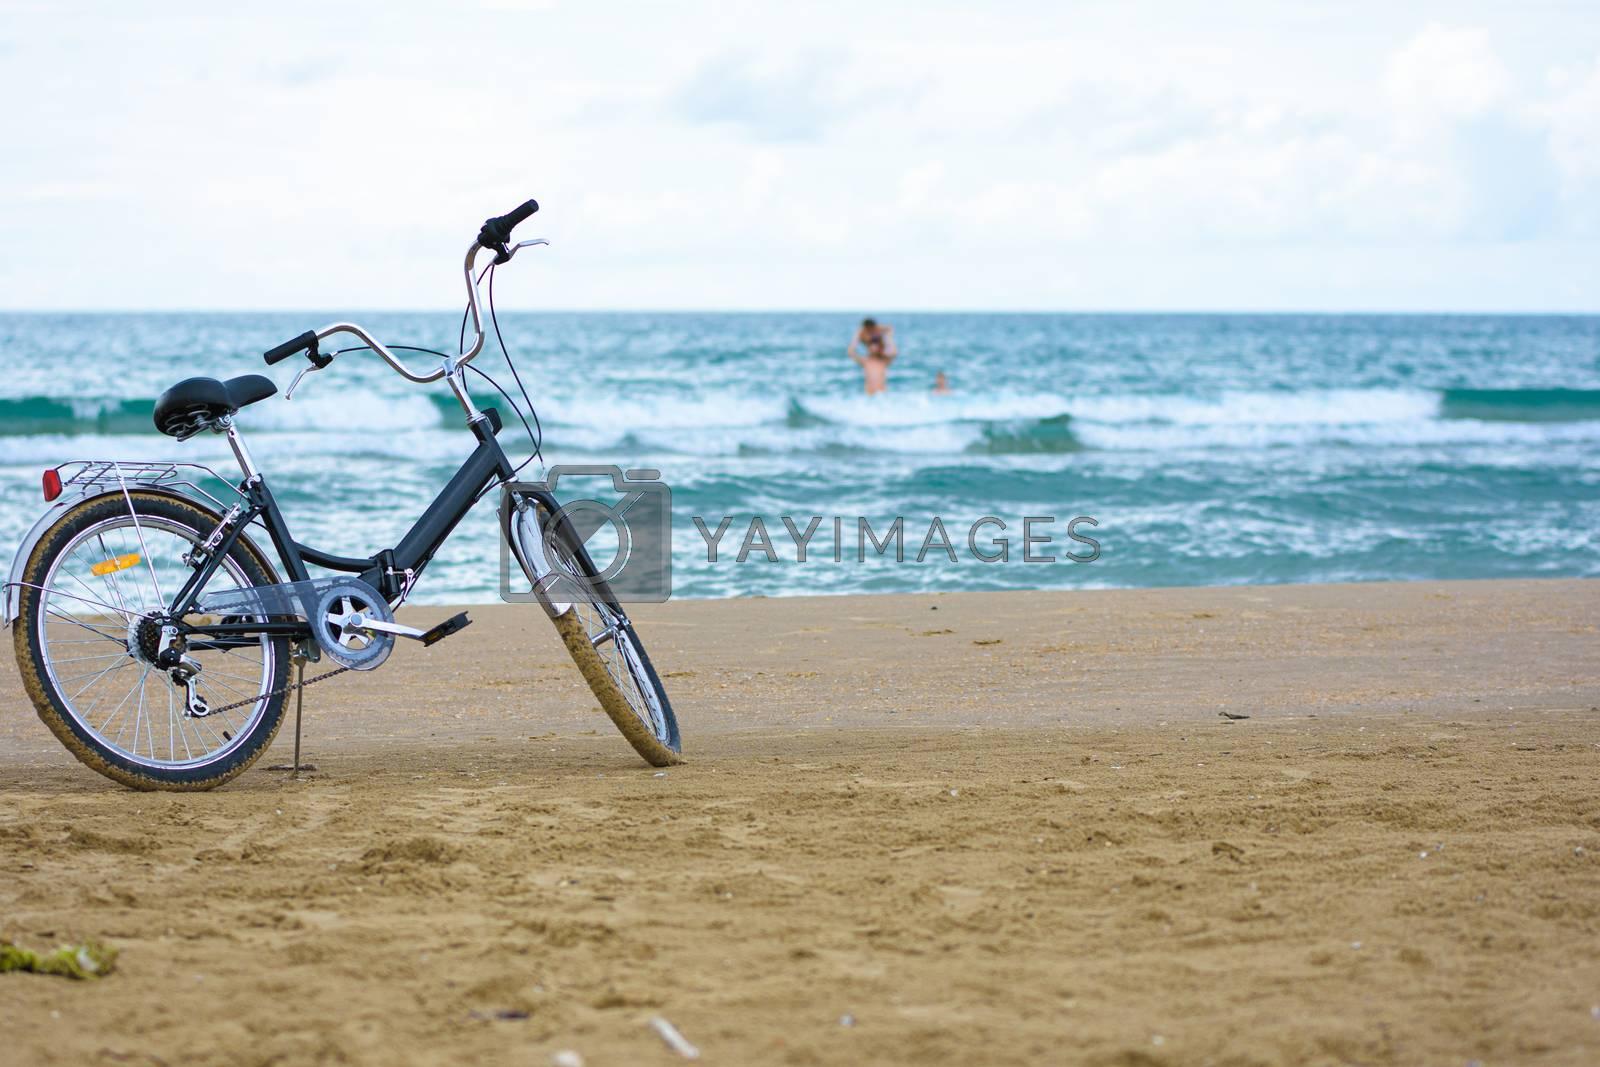 The bike stands on the sandy sea beach